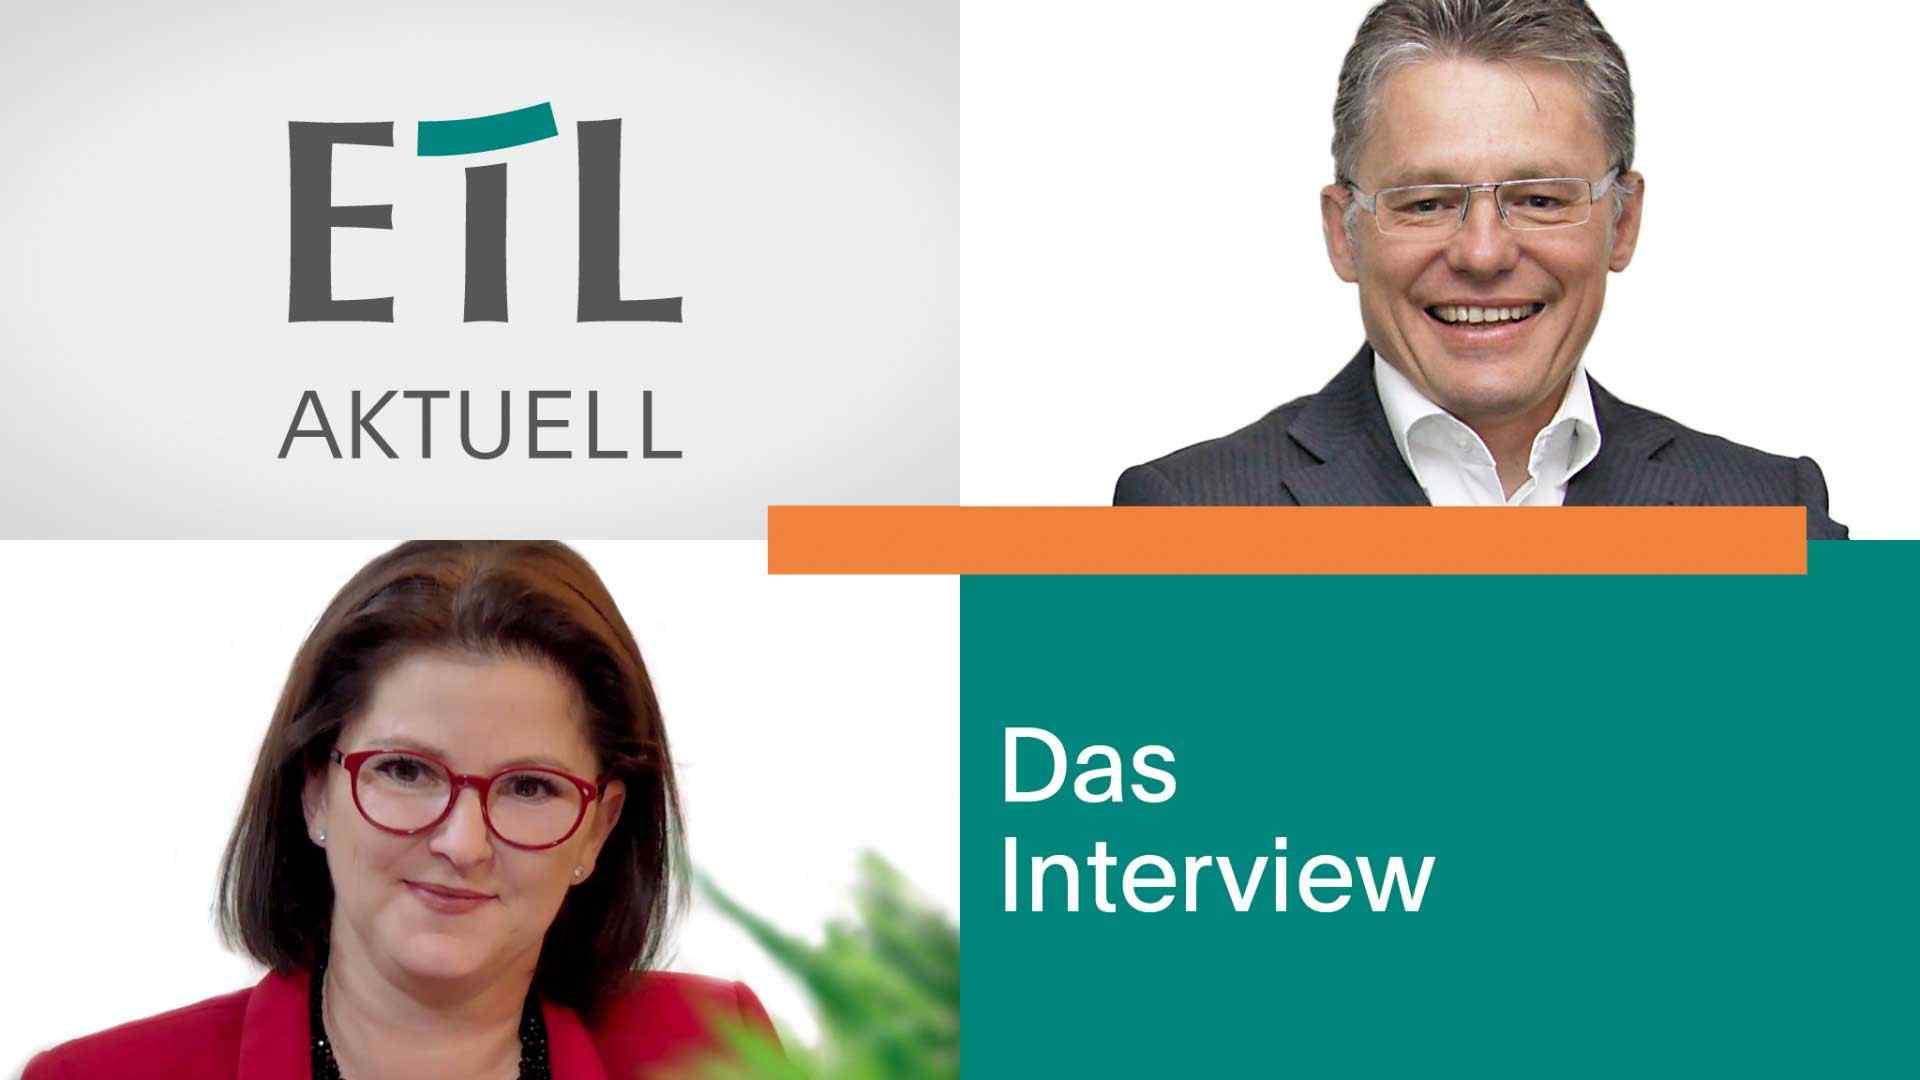 Arbeitsrecht, Home-Office, Interview, Podcast, Video: ETL AKTUELL – Folge 2: Home-Office und Arbeitsrecht während der Pandemie